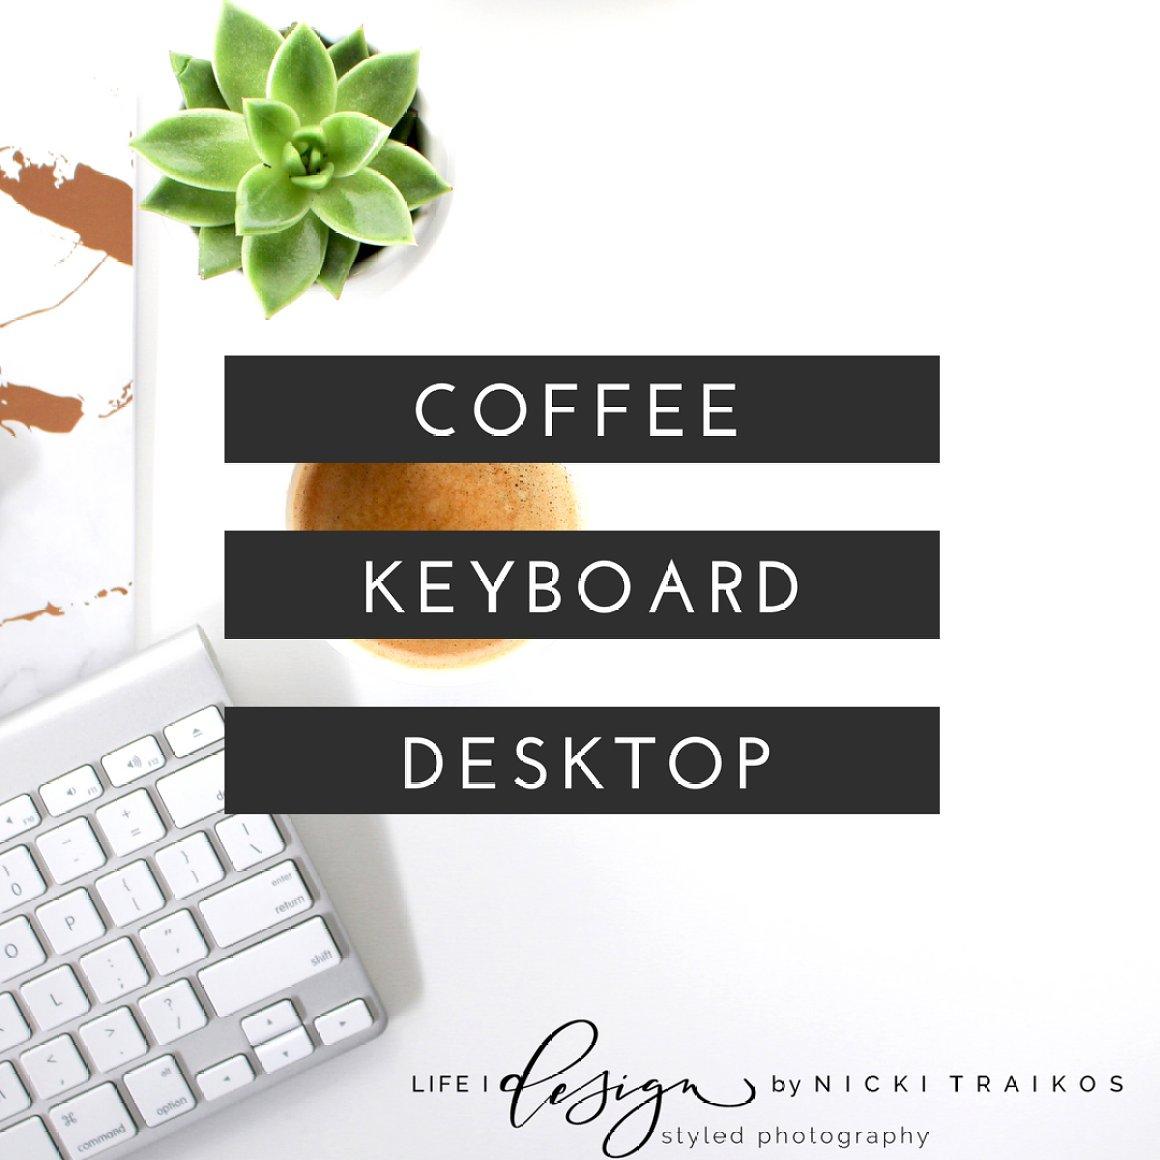 Minimalist desktop with Coffee